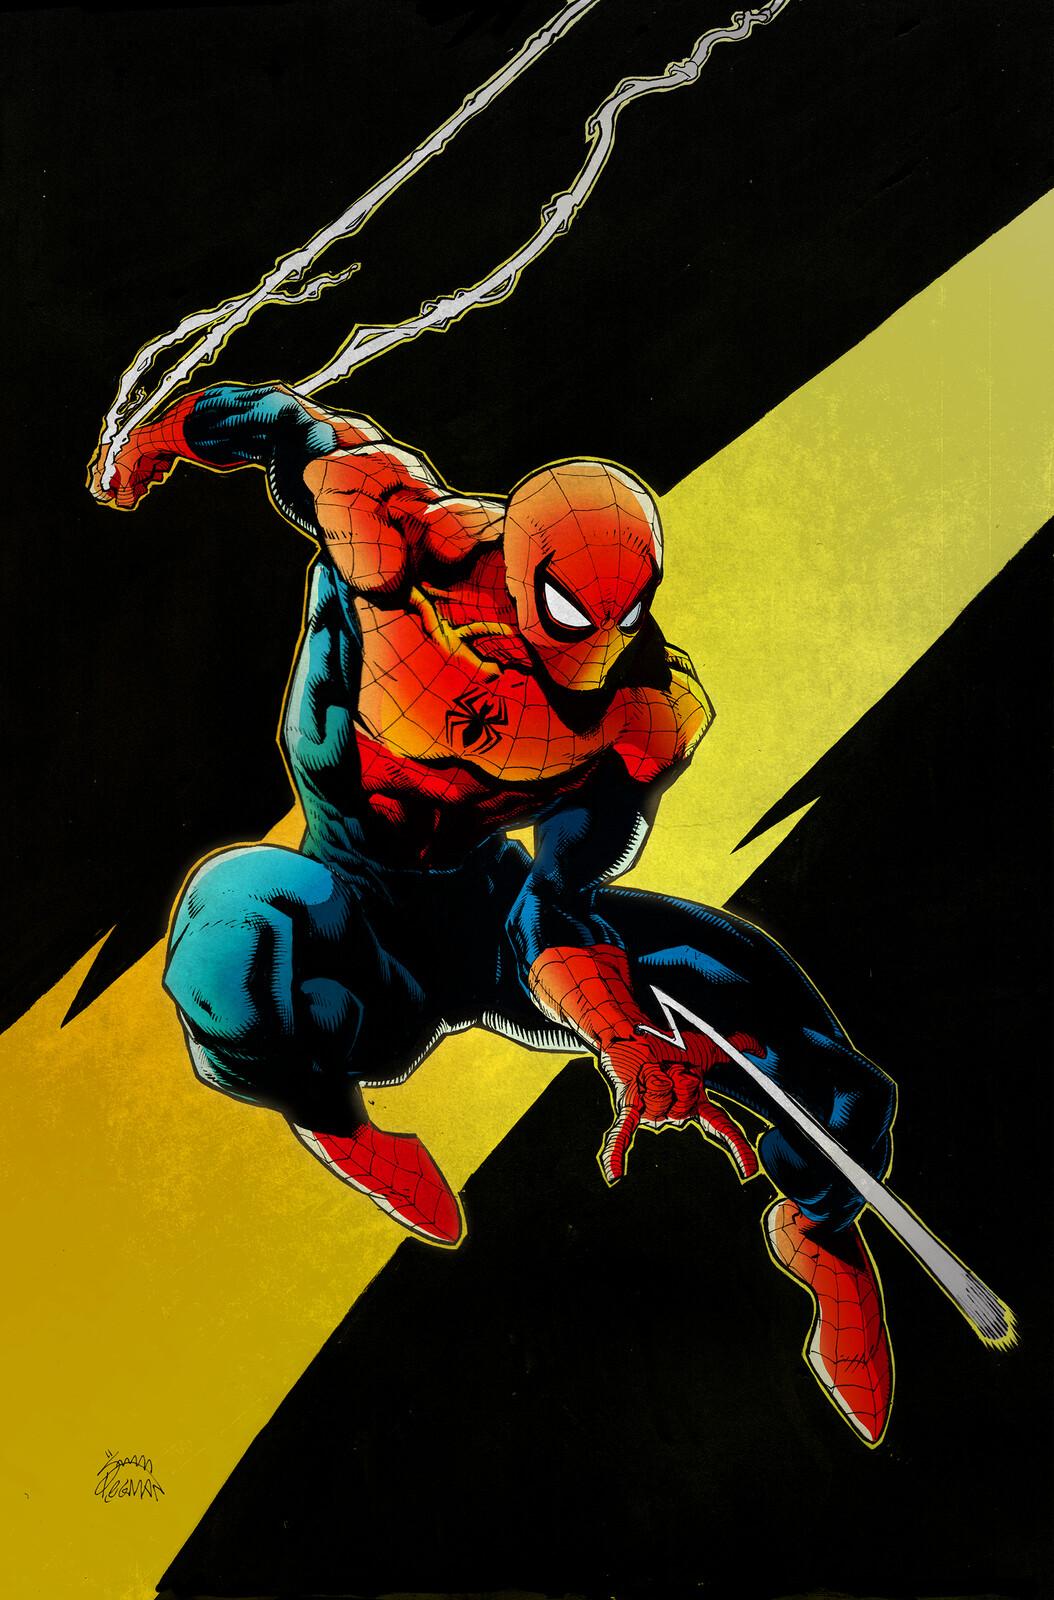 Spiderman - My colours / Ryan Stegman inks